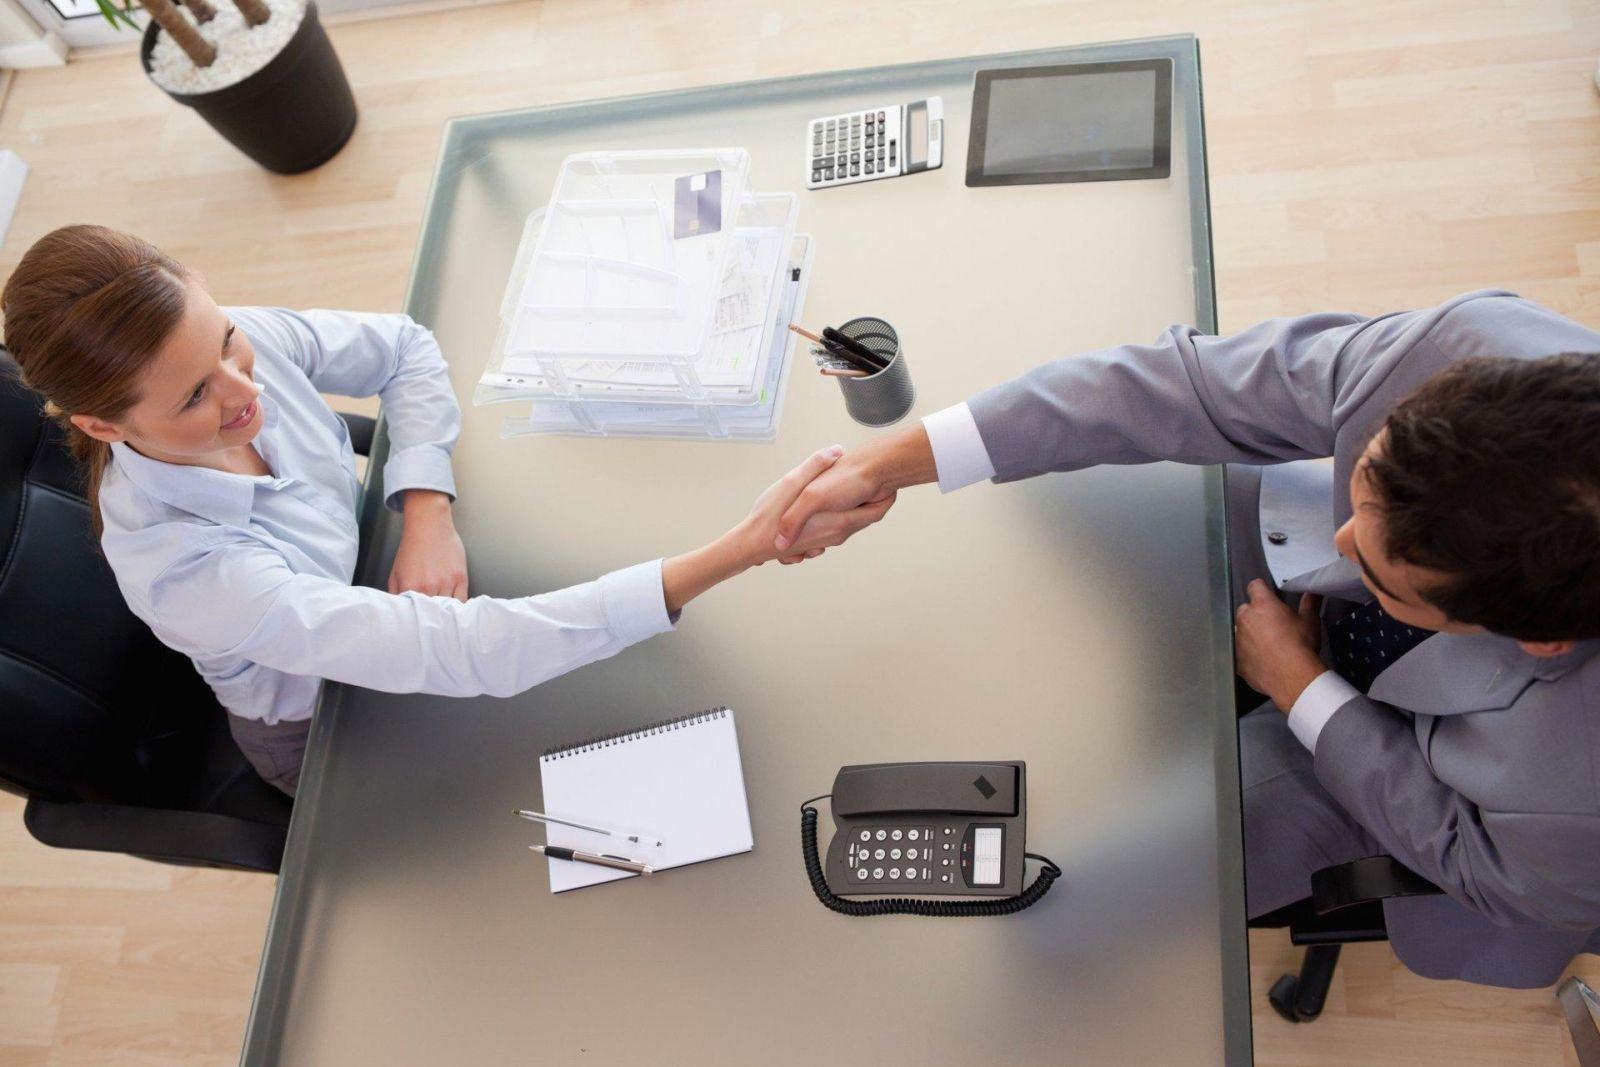 Сбербанк представил сервис по проверке людей при найме на работу (34.2)